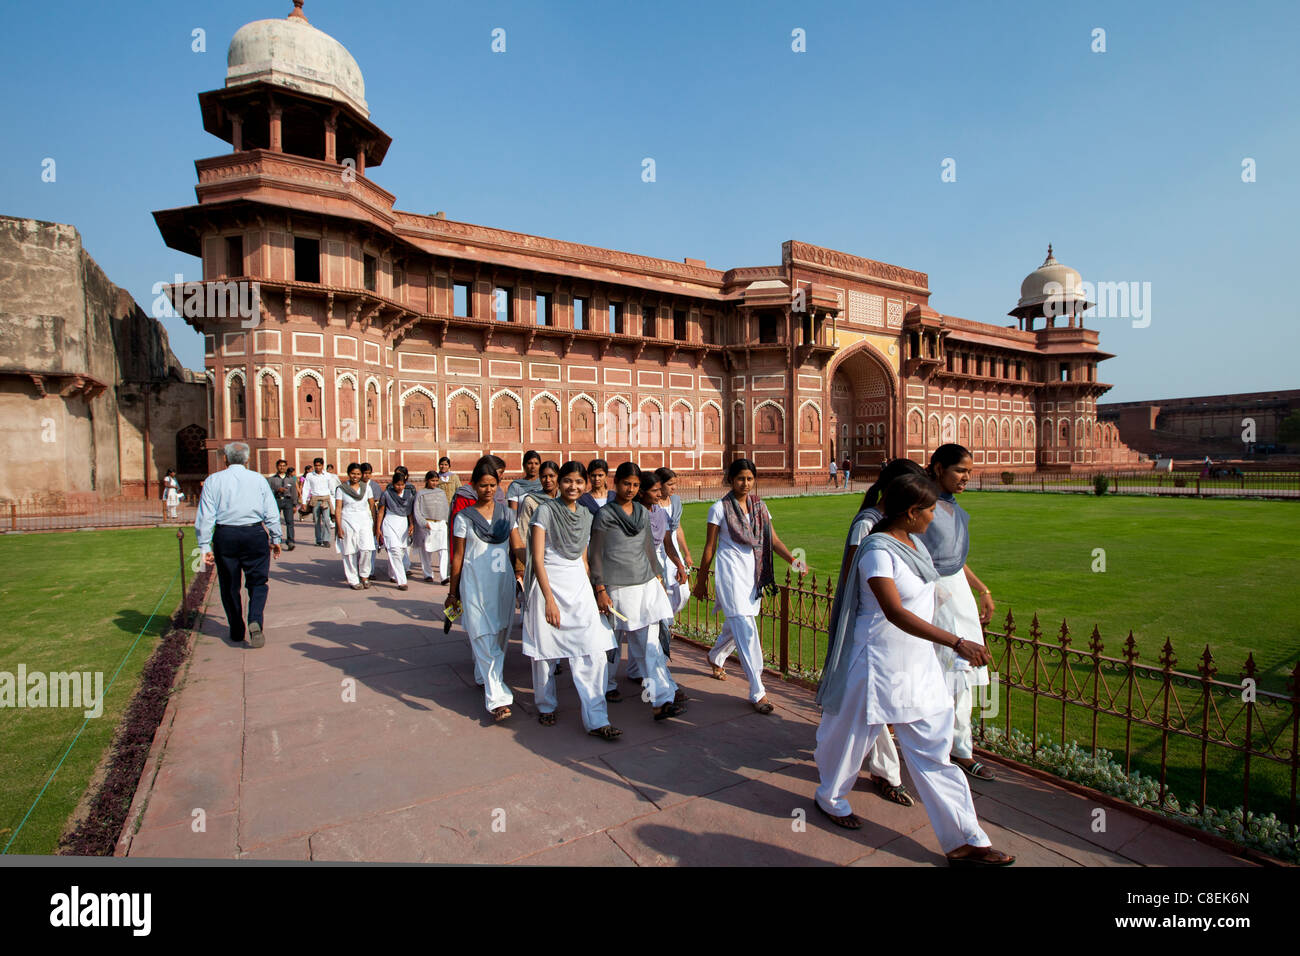 Tourists at Agra Fort the Jahangir Mahal, zenana palace residence of Rajput wives of Mughal Emperor Akbar - Stock Image